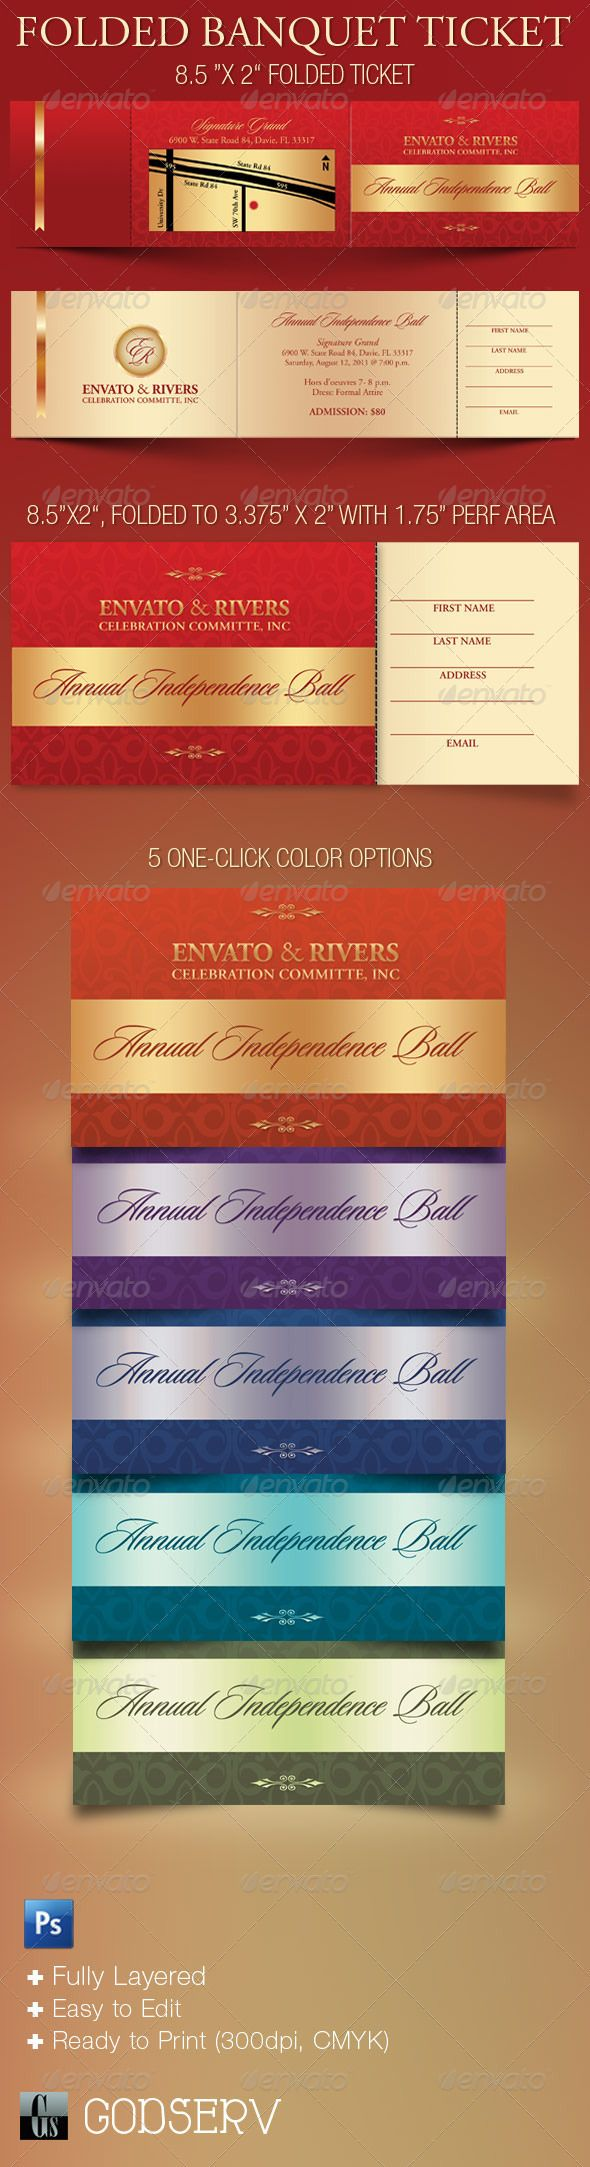 banquet templates